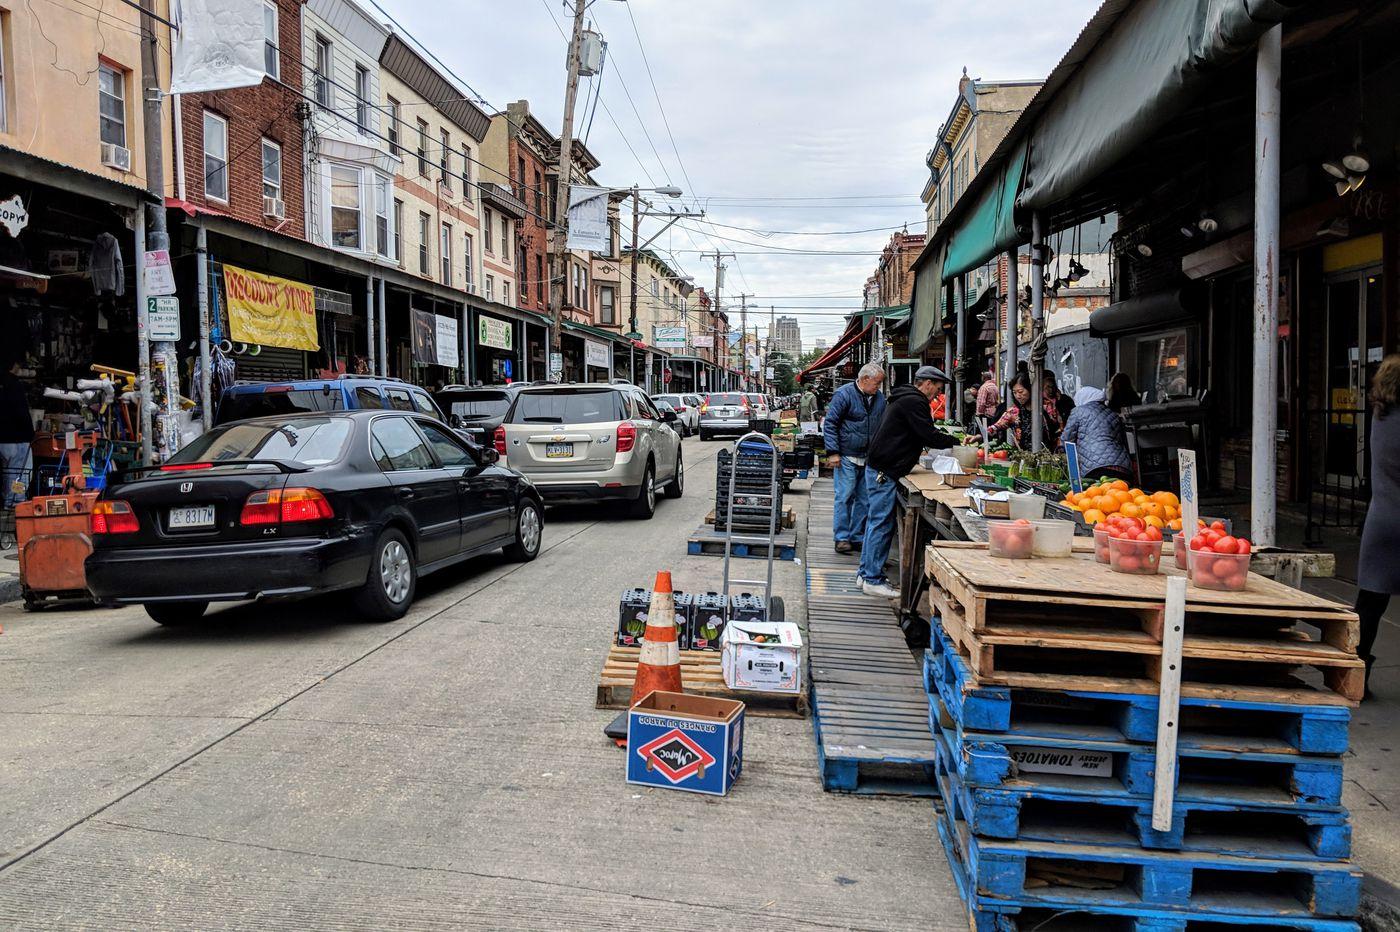 It's time to pedestrianize the Italian Market | Opinion